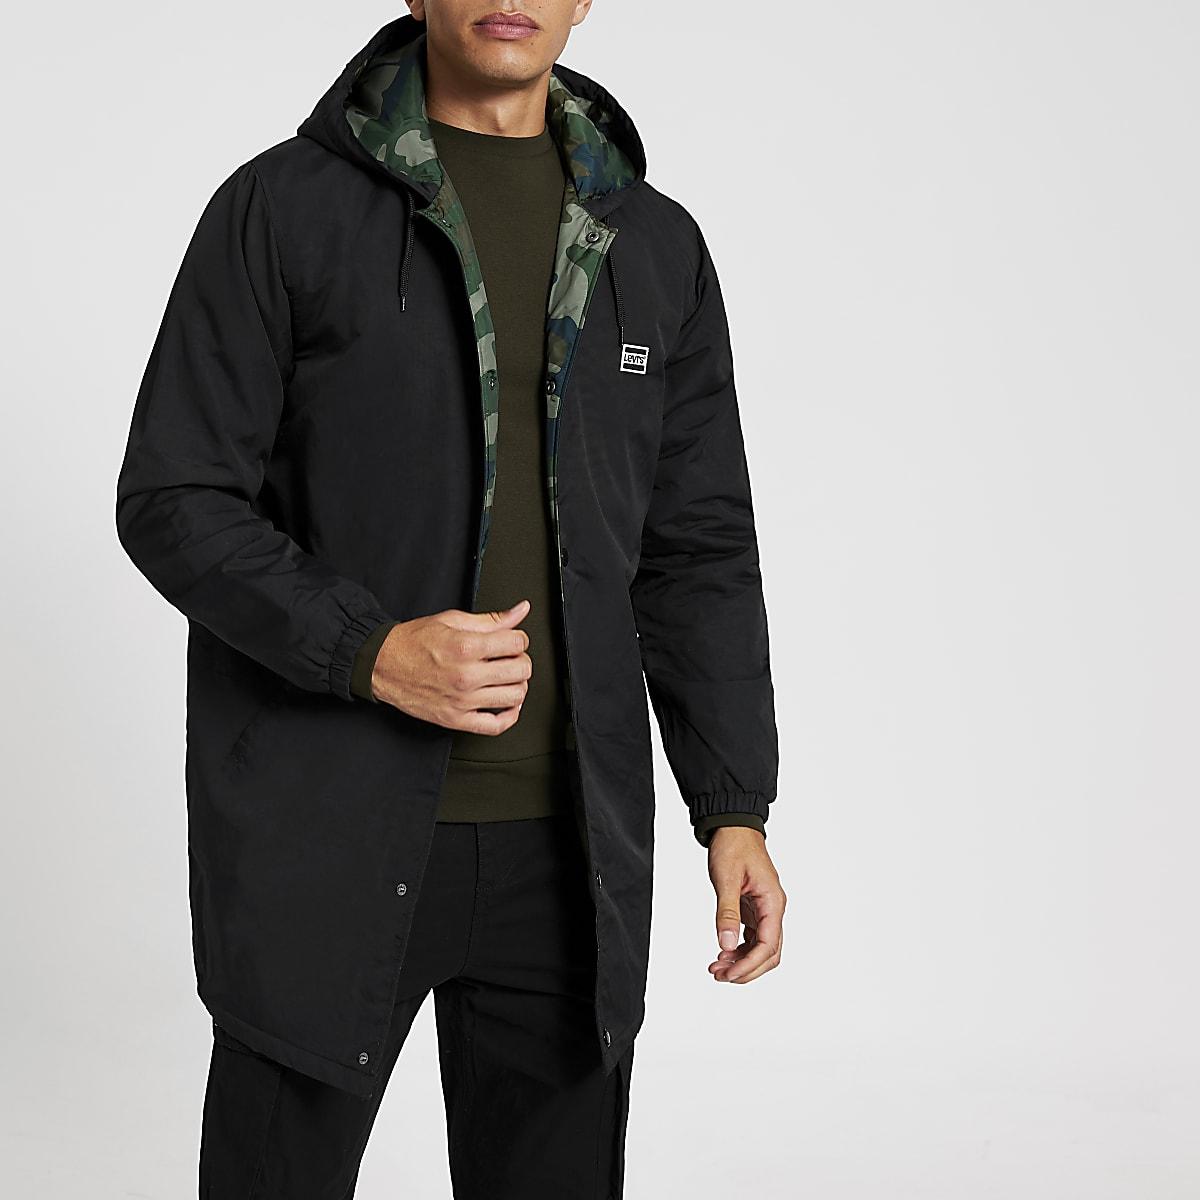 Levi's black hooded coach jacket